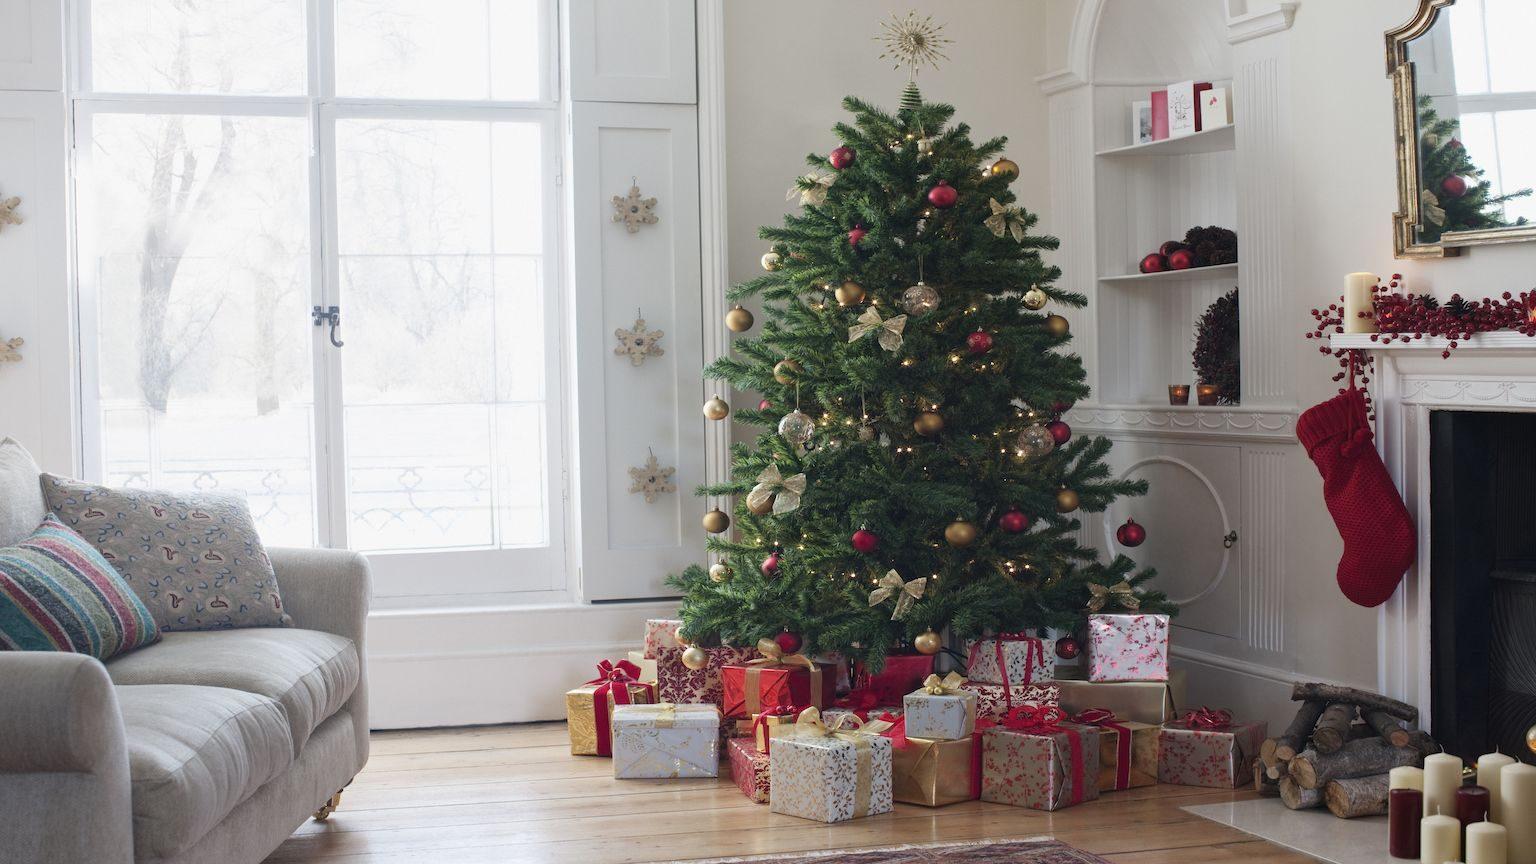 Presents underneath the Christmas tree